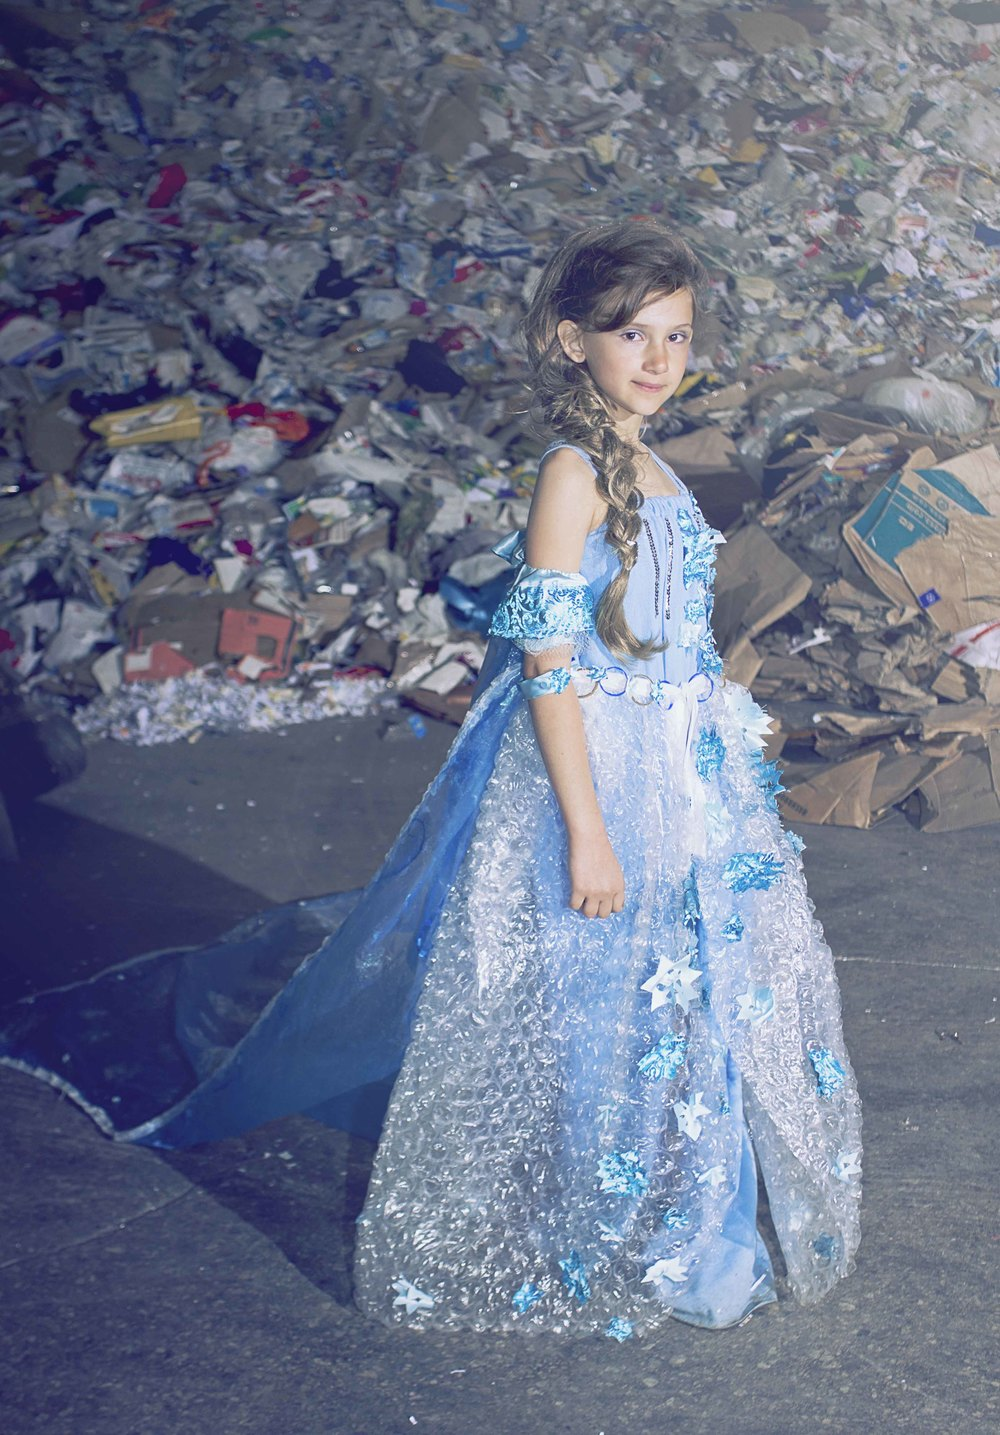 Photographer: Rebecca McFarland, Designer: Perla McBeain, Model: Briana McBeain